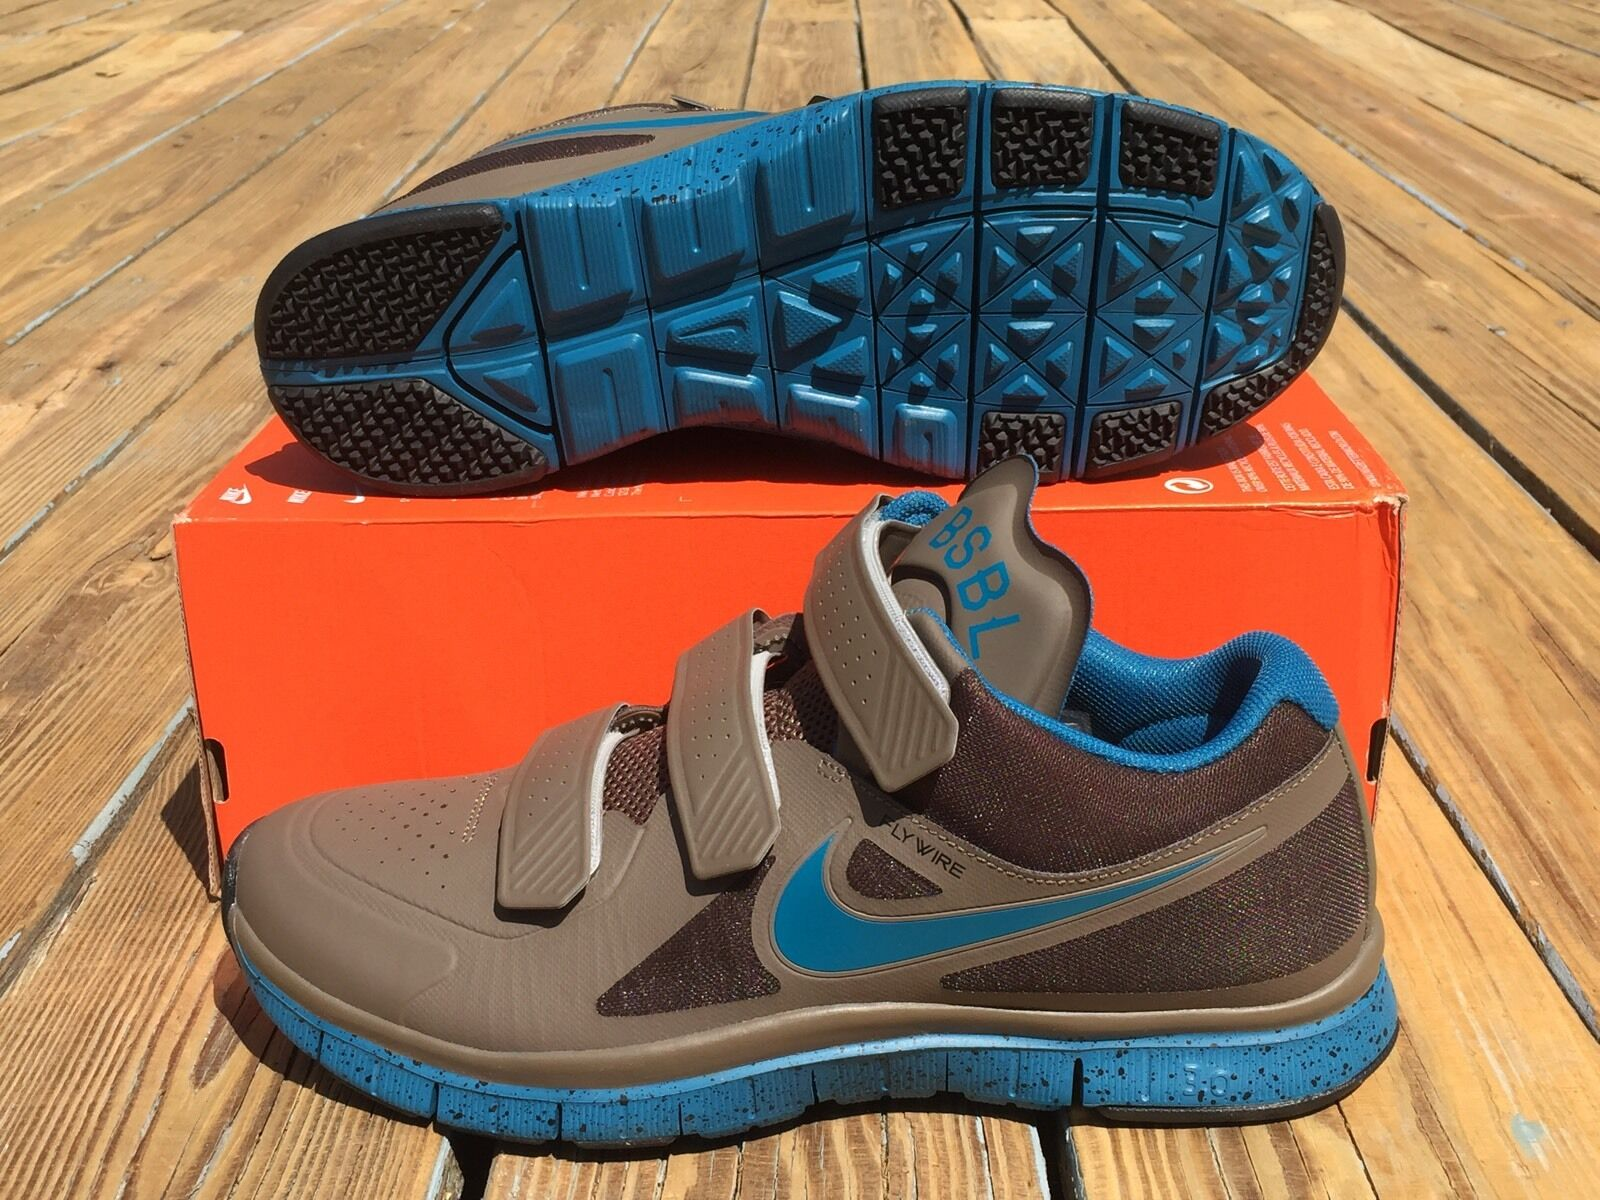 Nike MVP Free Trainer Elite JAPAN SAMPLE Chaussures Gris bleu SZ 10 ( 599368-230 )